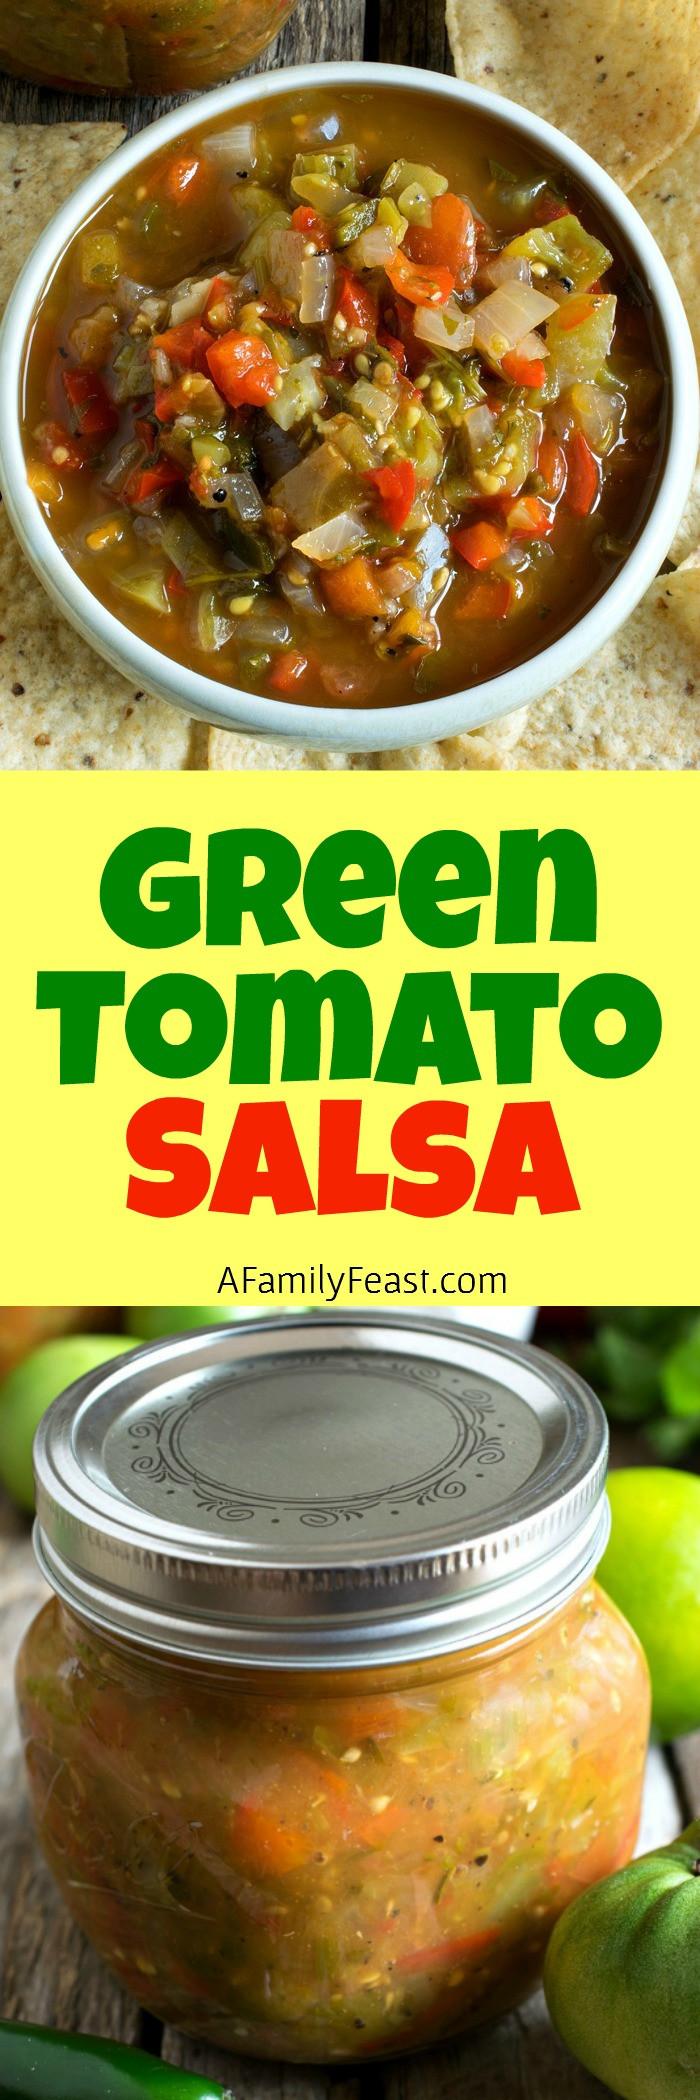 Green Tomato Salsa  Peg's Green Tomato Salsa A Family Feast